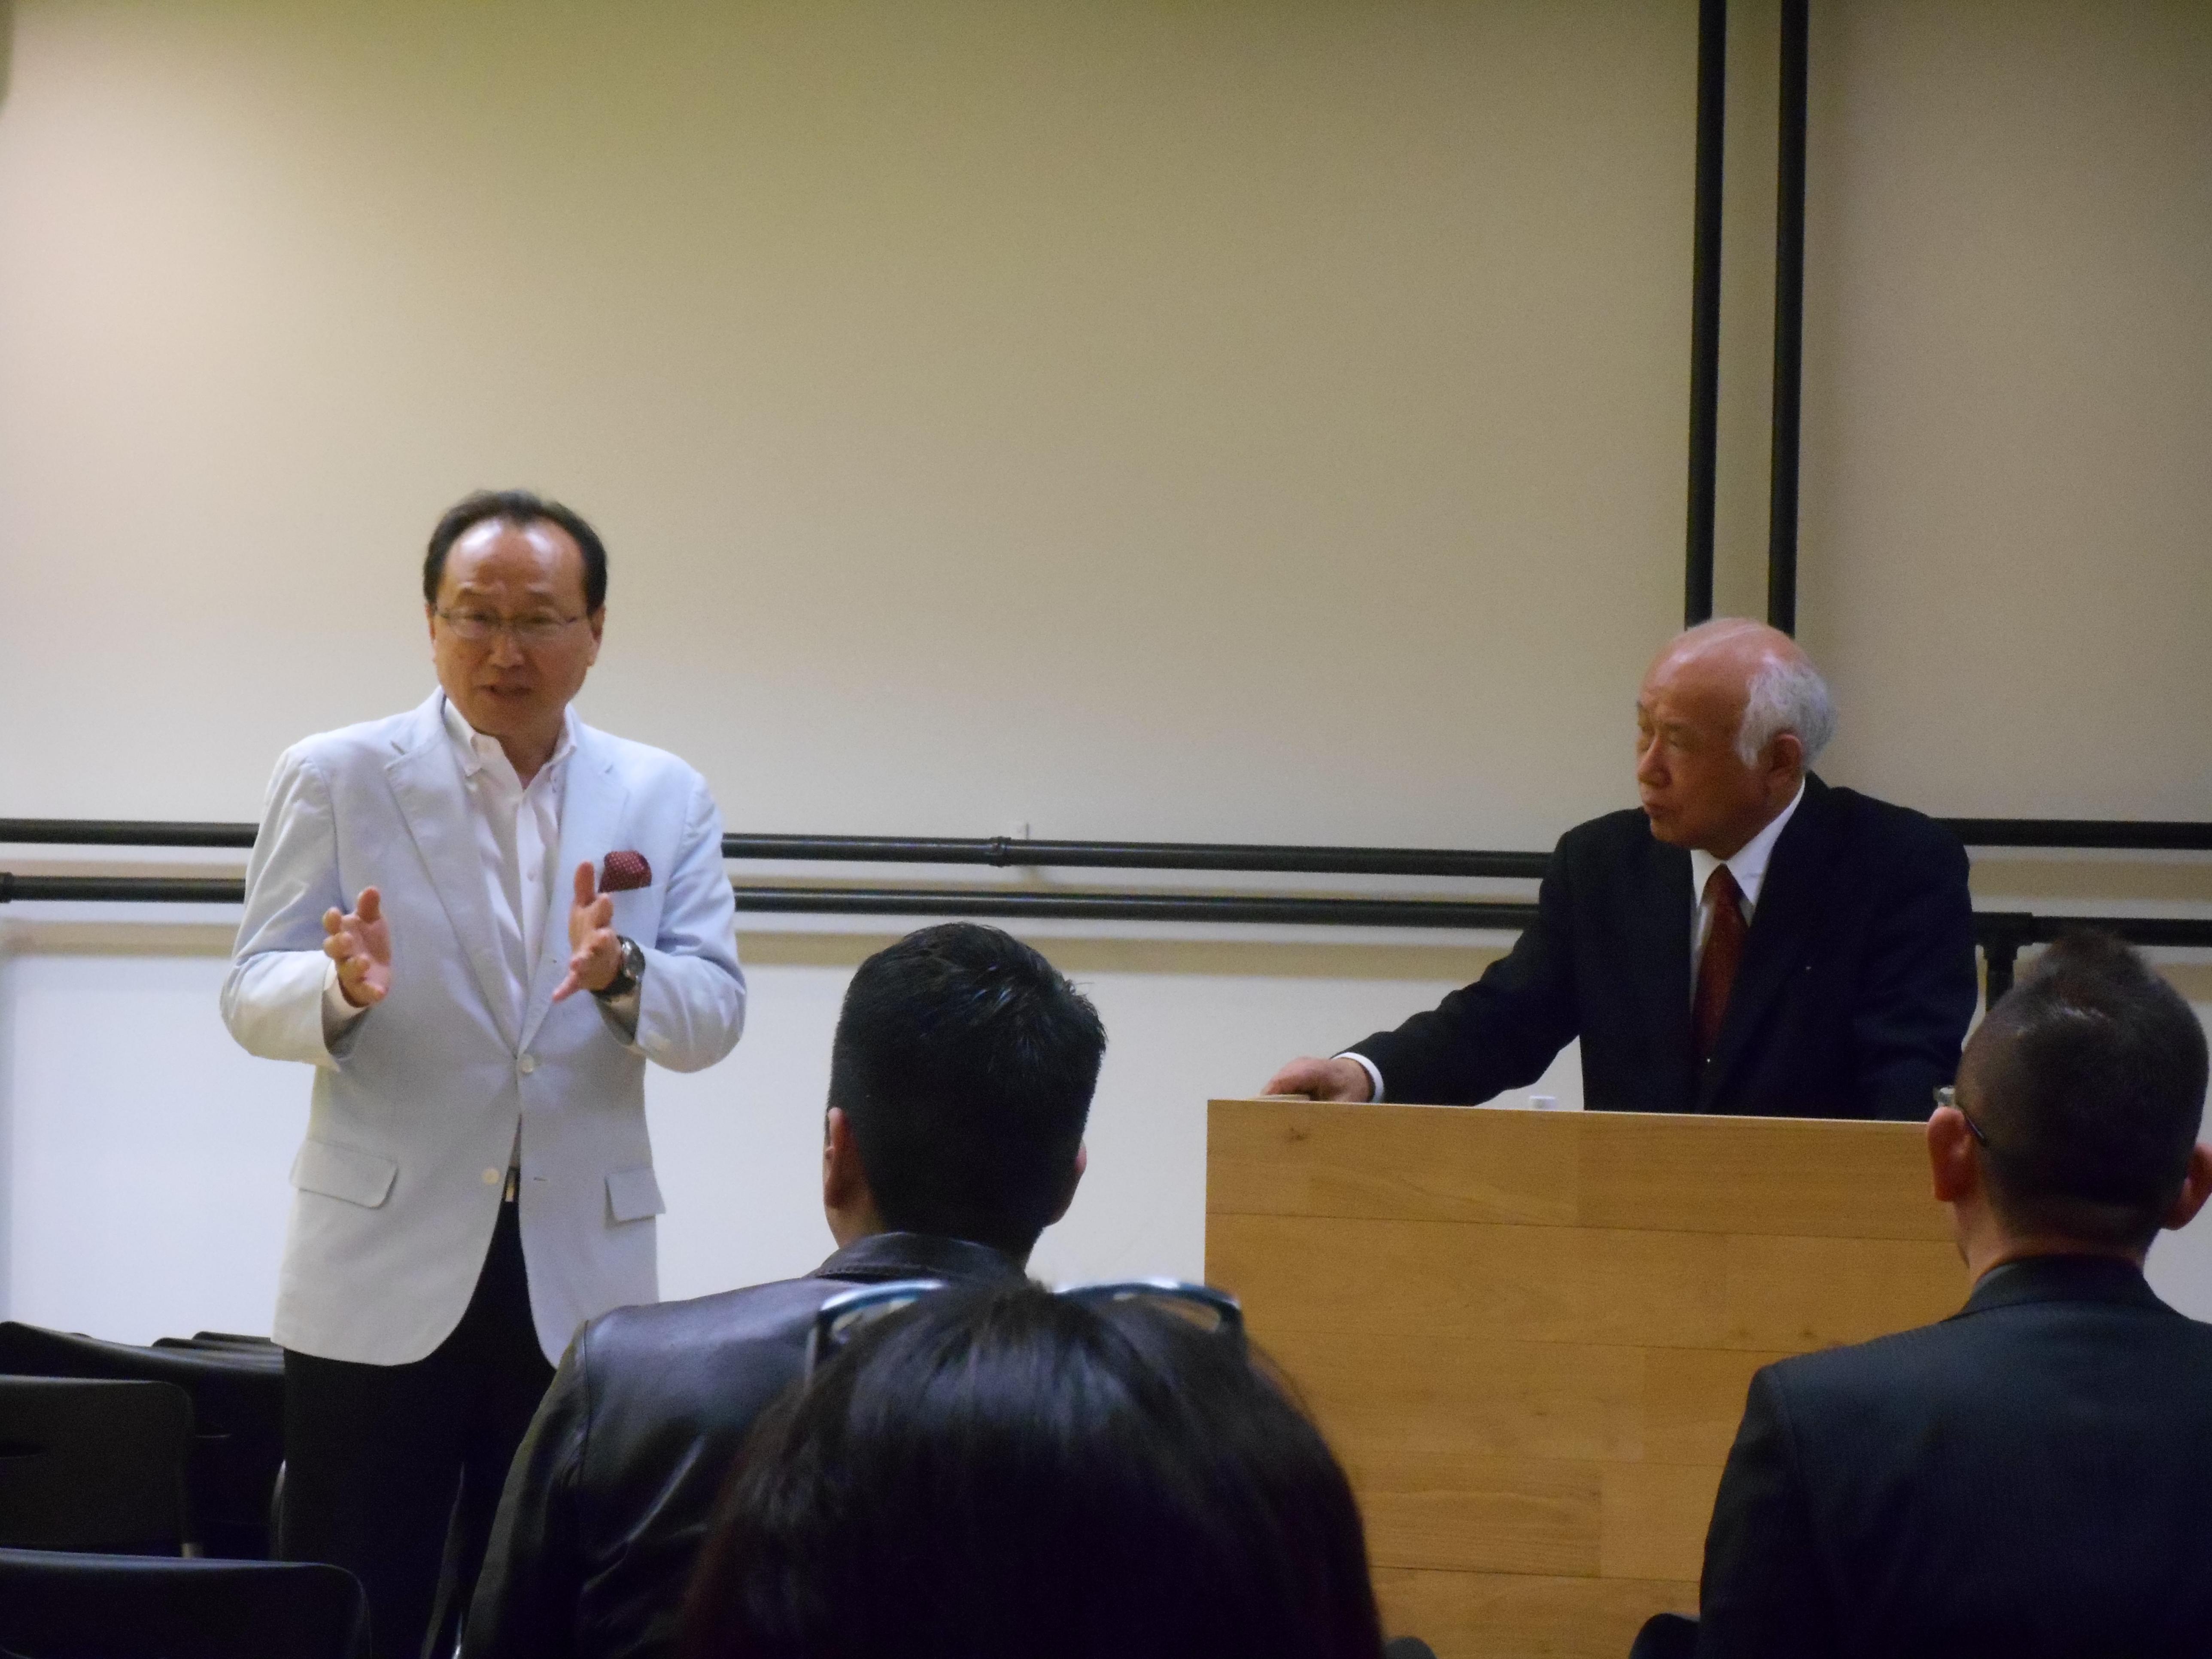 DSCN3736 - 4月1日東京思風塾の開催になります。